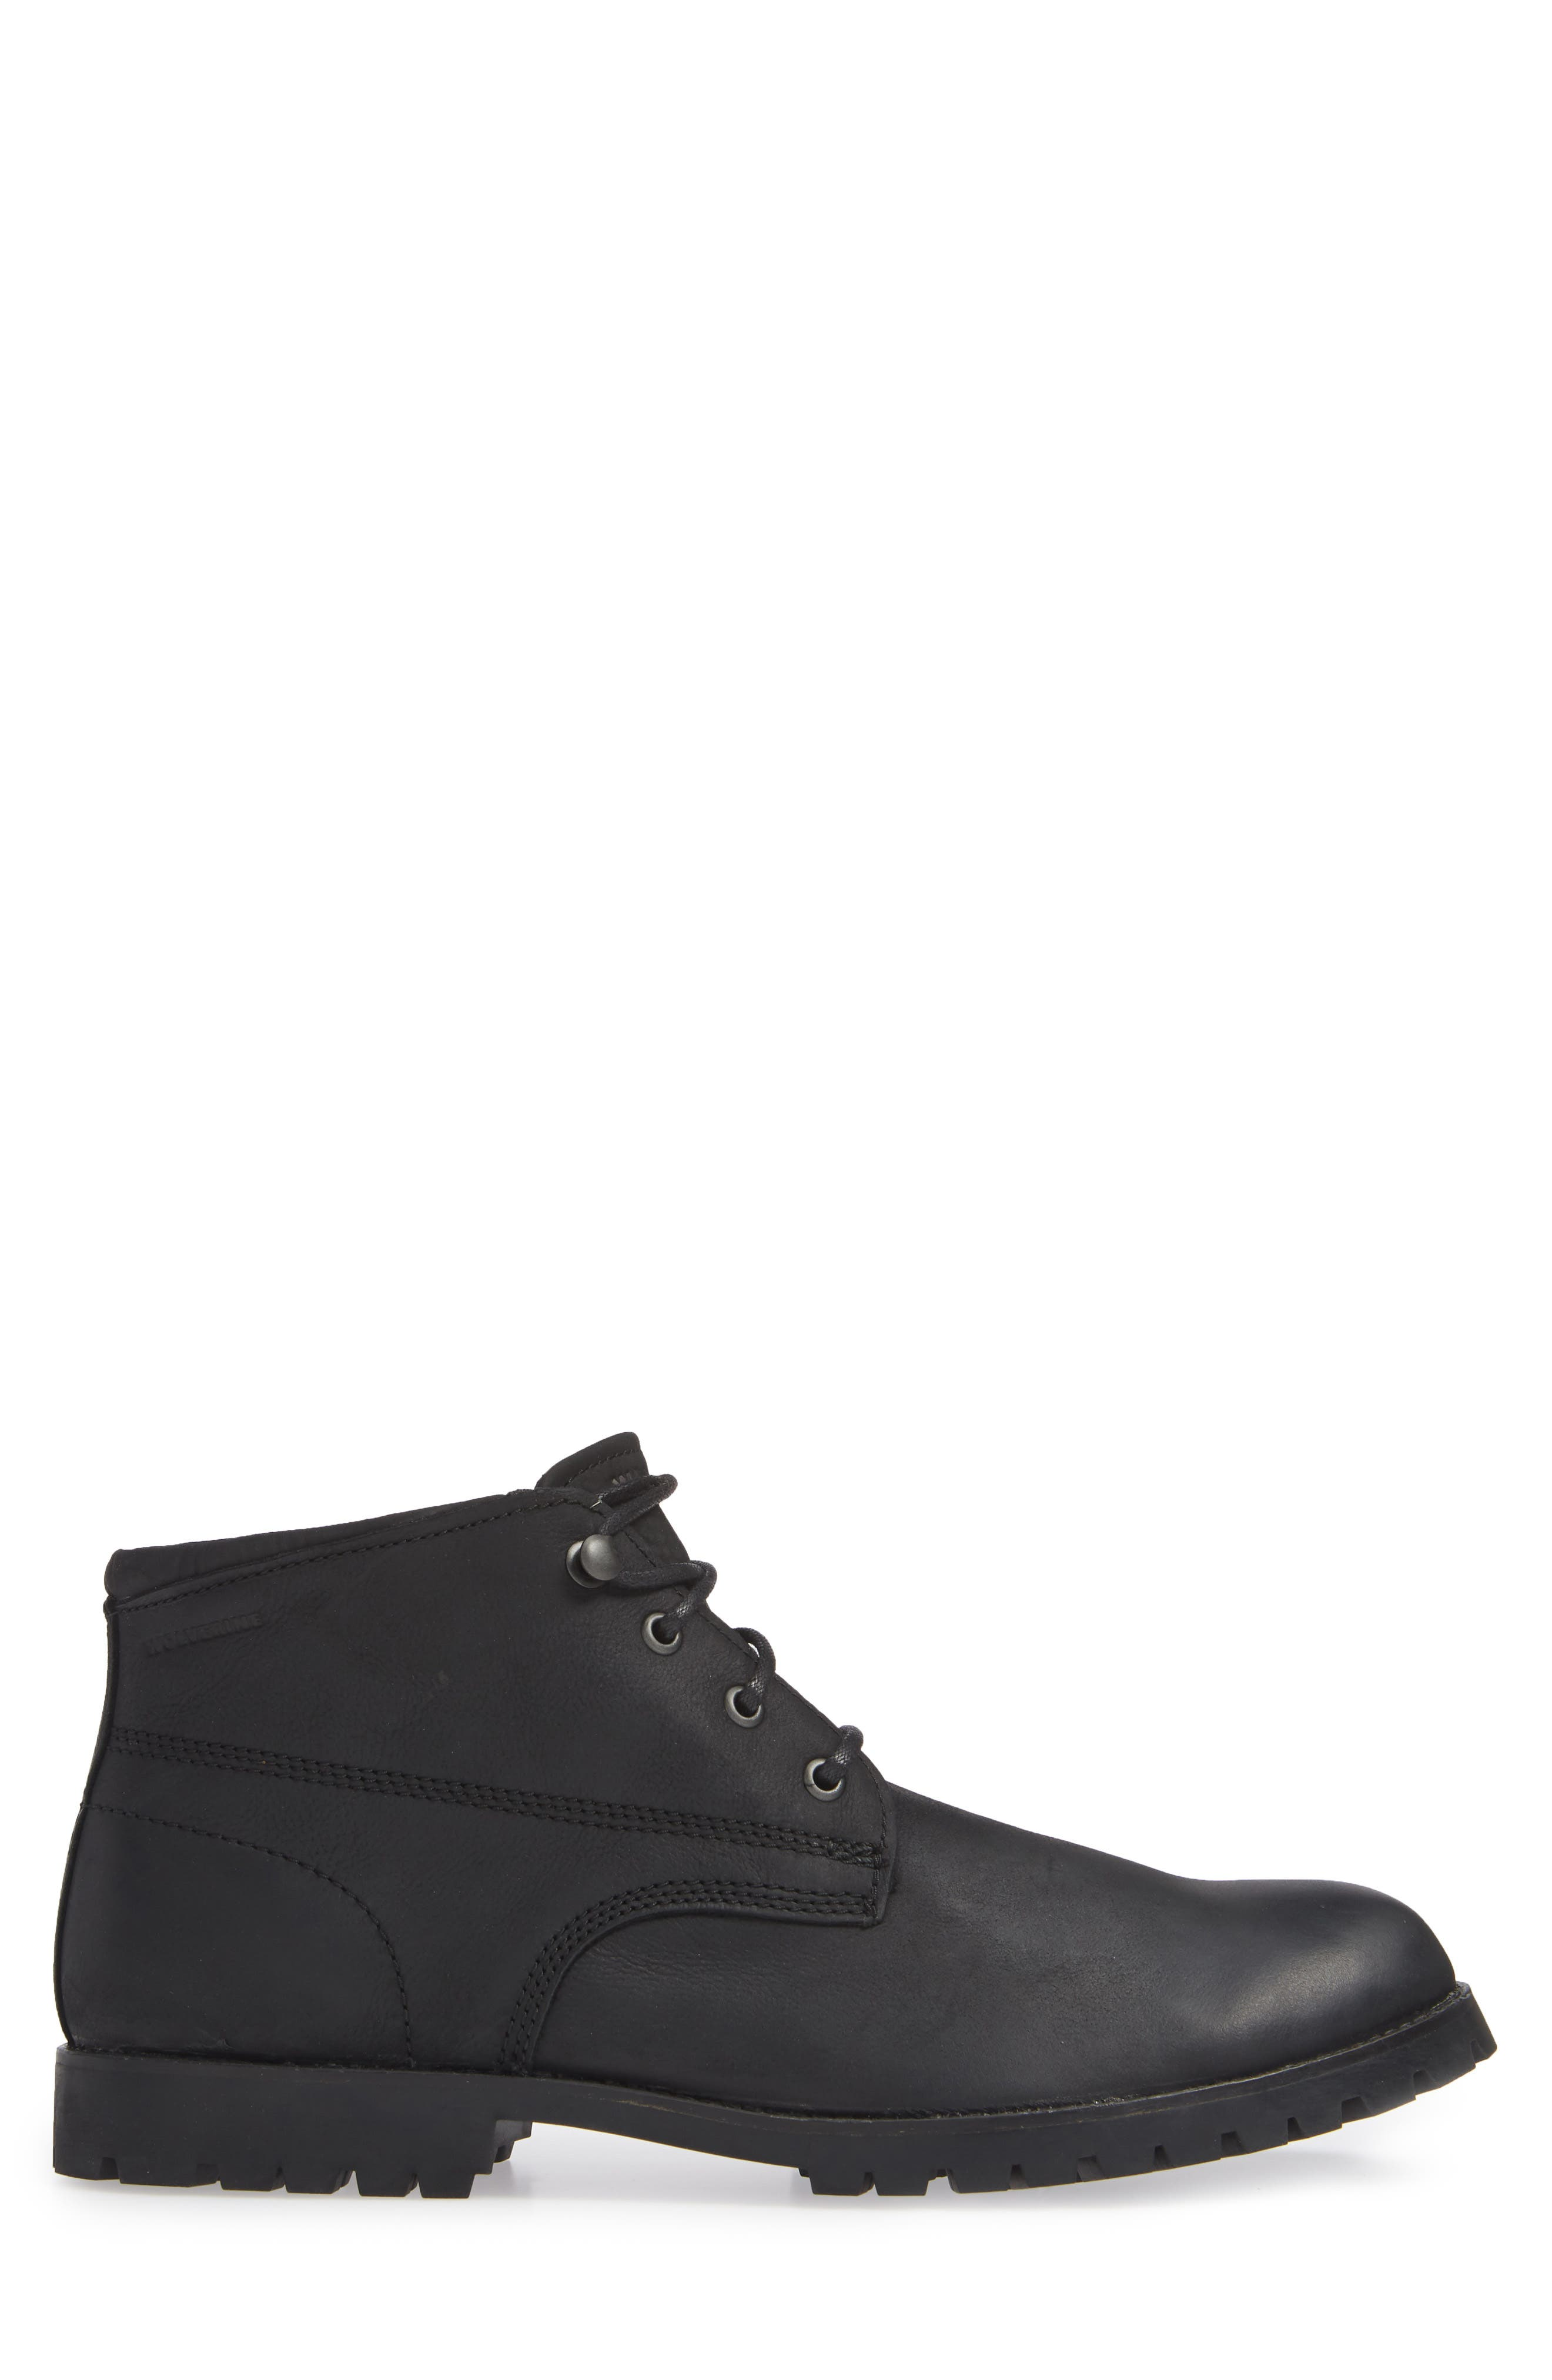 WOLVERINE,                             Cort Plain Toe Waterproof Boot,                             Alternate thumbnail 3, color,                             MEDIUM BLACK